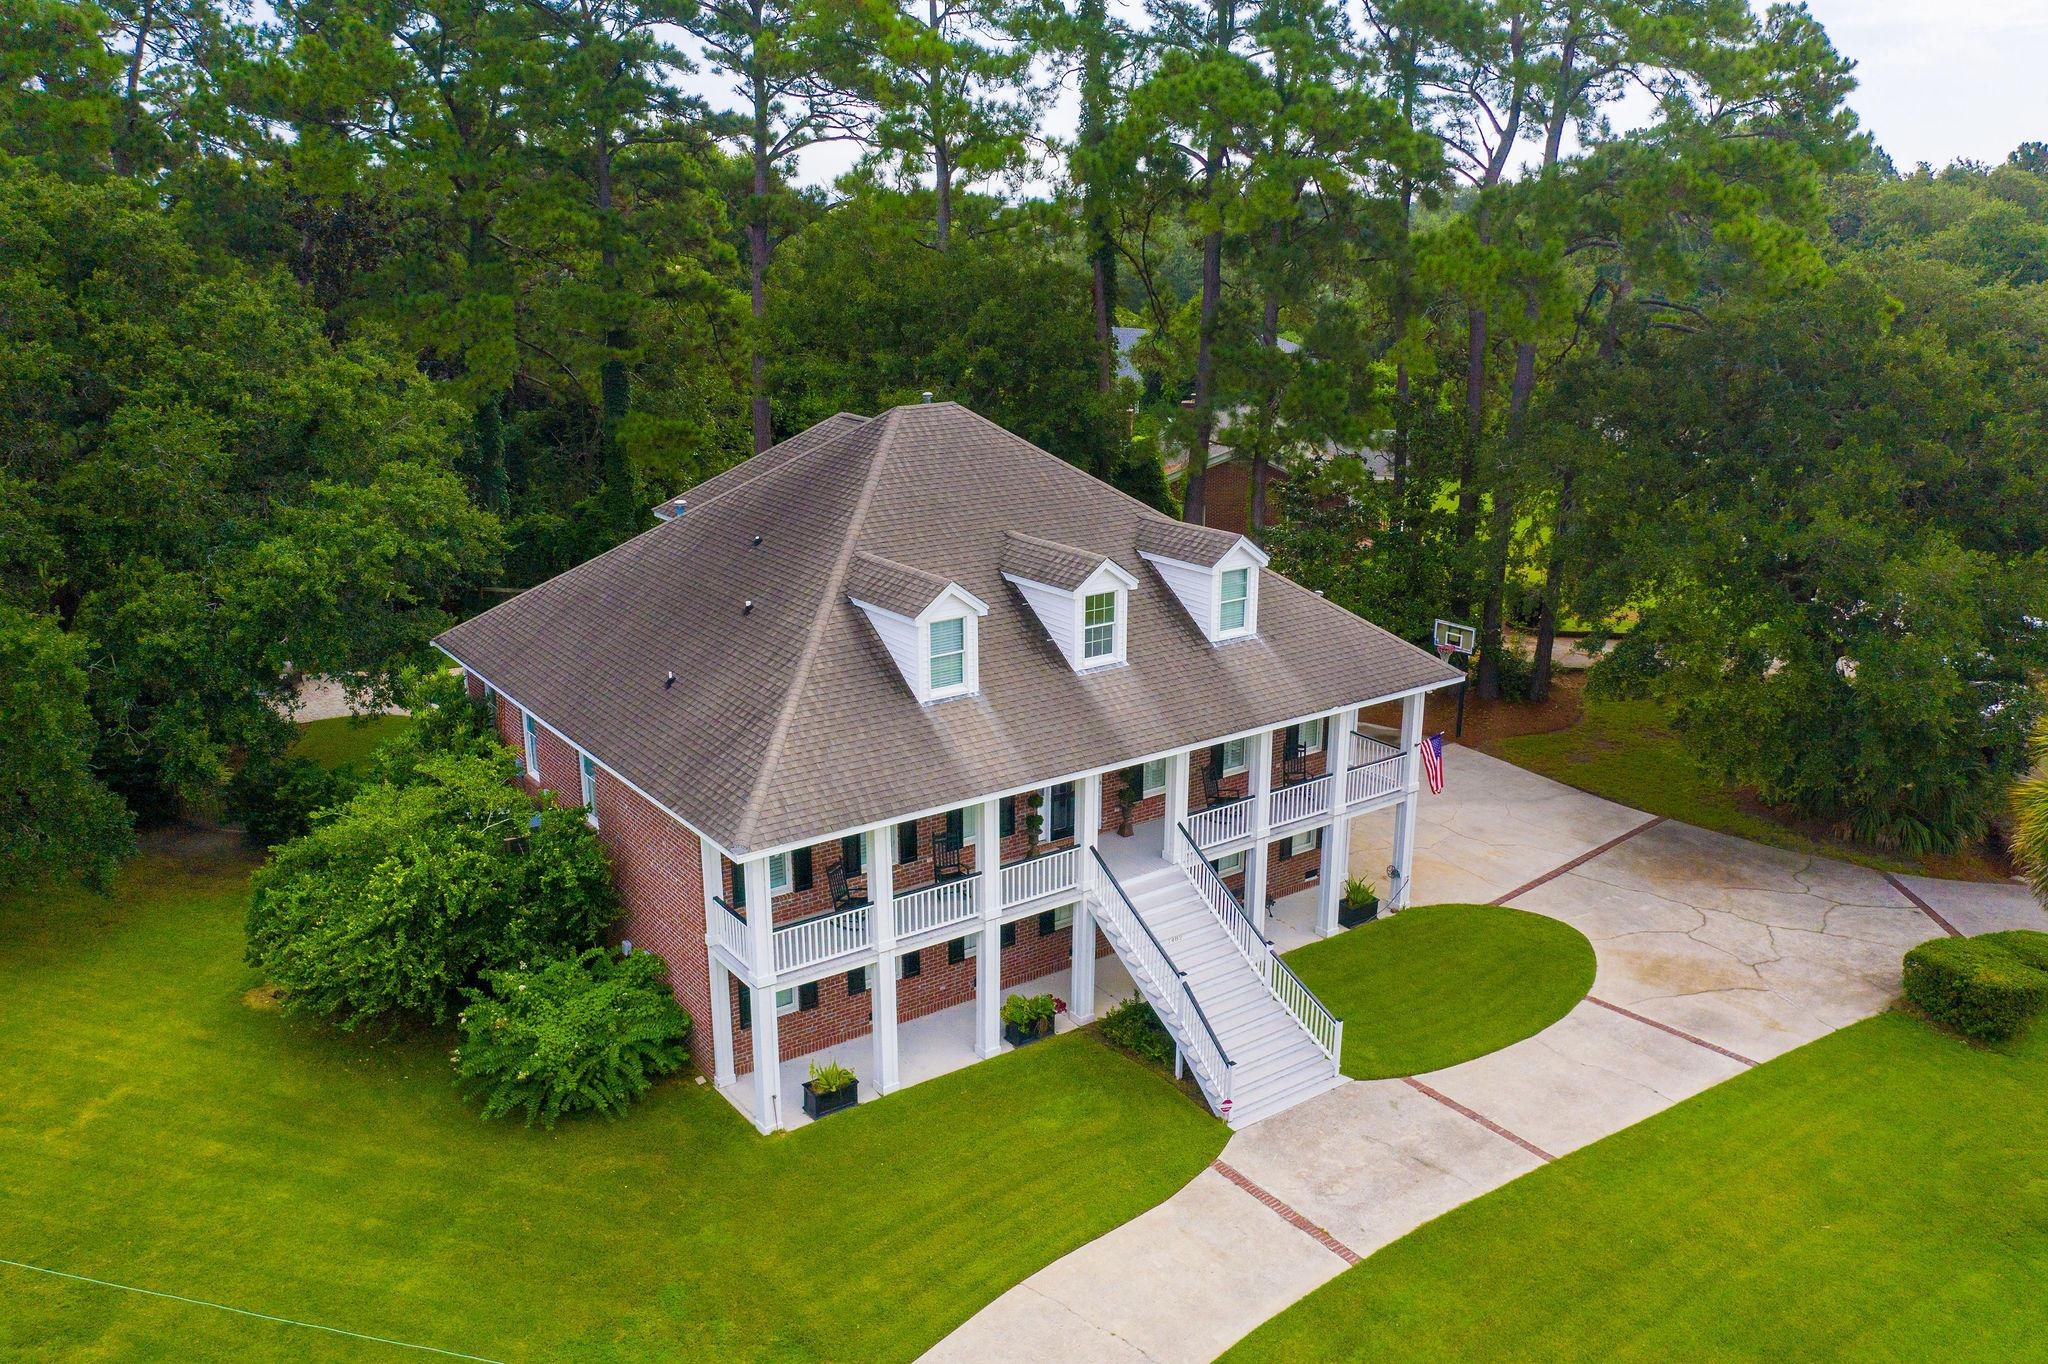 Country Club II Homes For Sale - 1482 Burningtree, Charleston, SC - 6